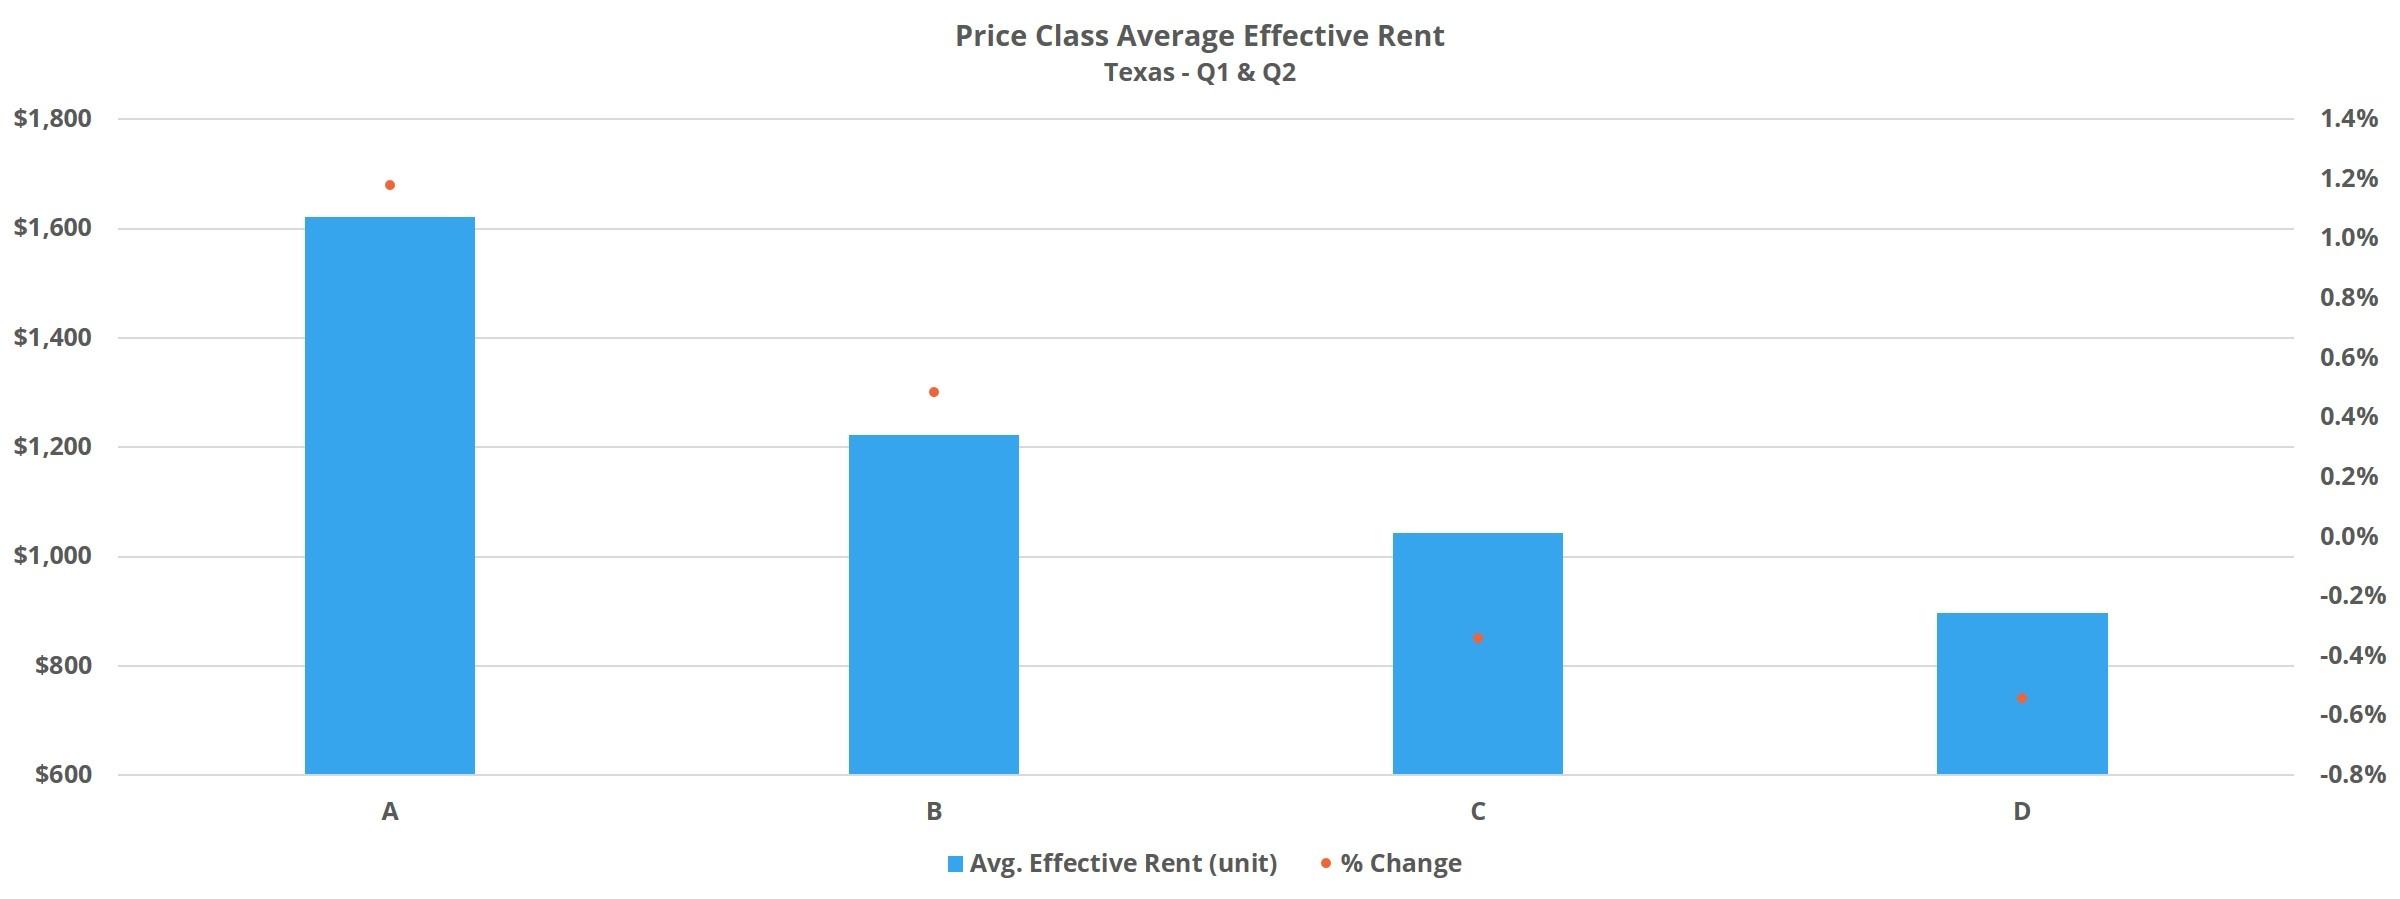 Price Class Average Effective Rent